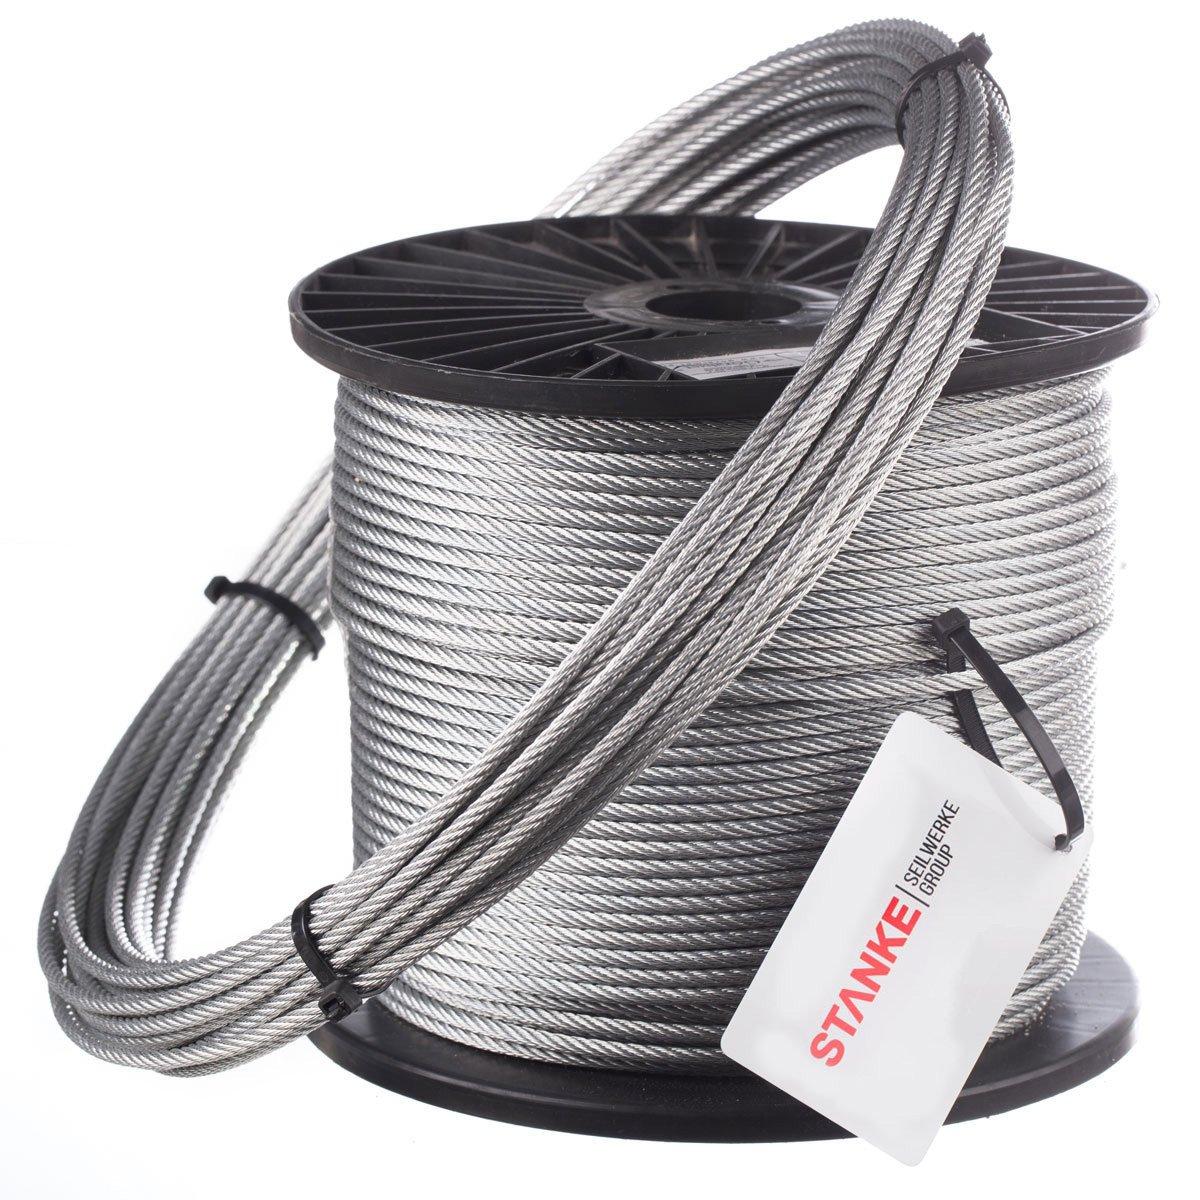 Seilwerk STANKE 25m 8mm Drahtseil 6x19 verzinkt Stahlseil Forstseil DIN Windenseil Seil Draht Stahl